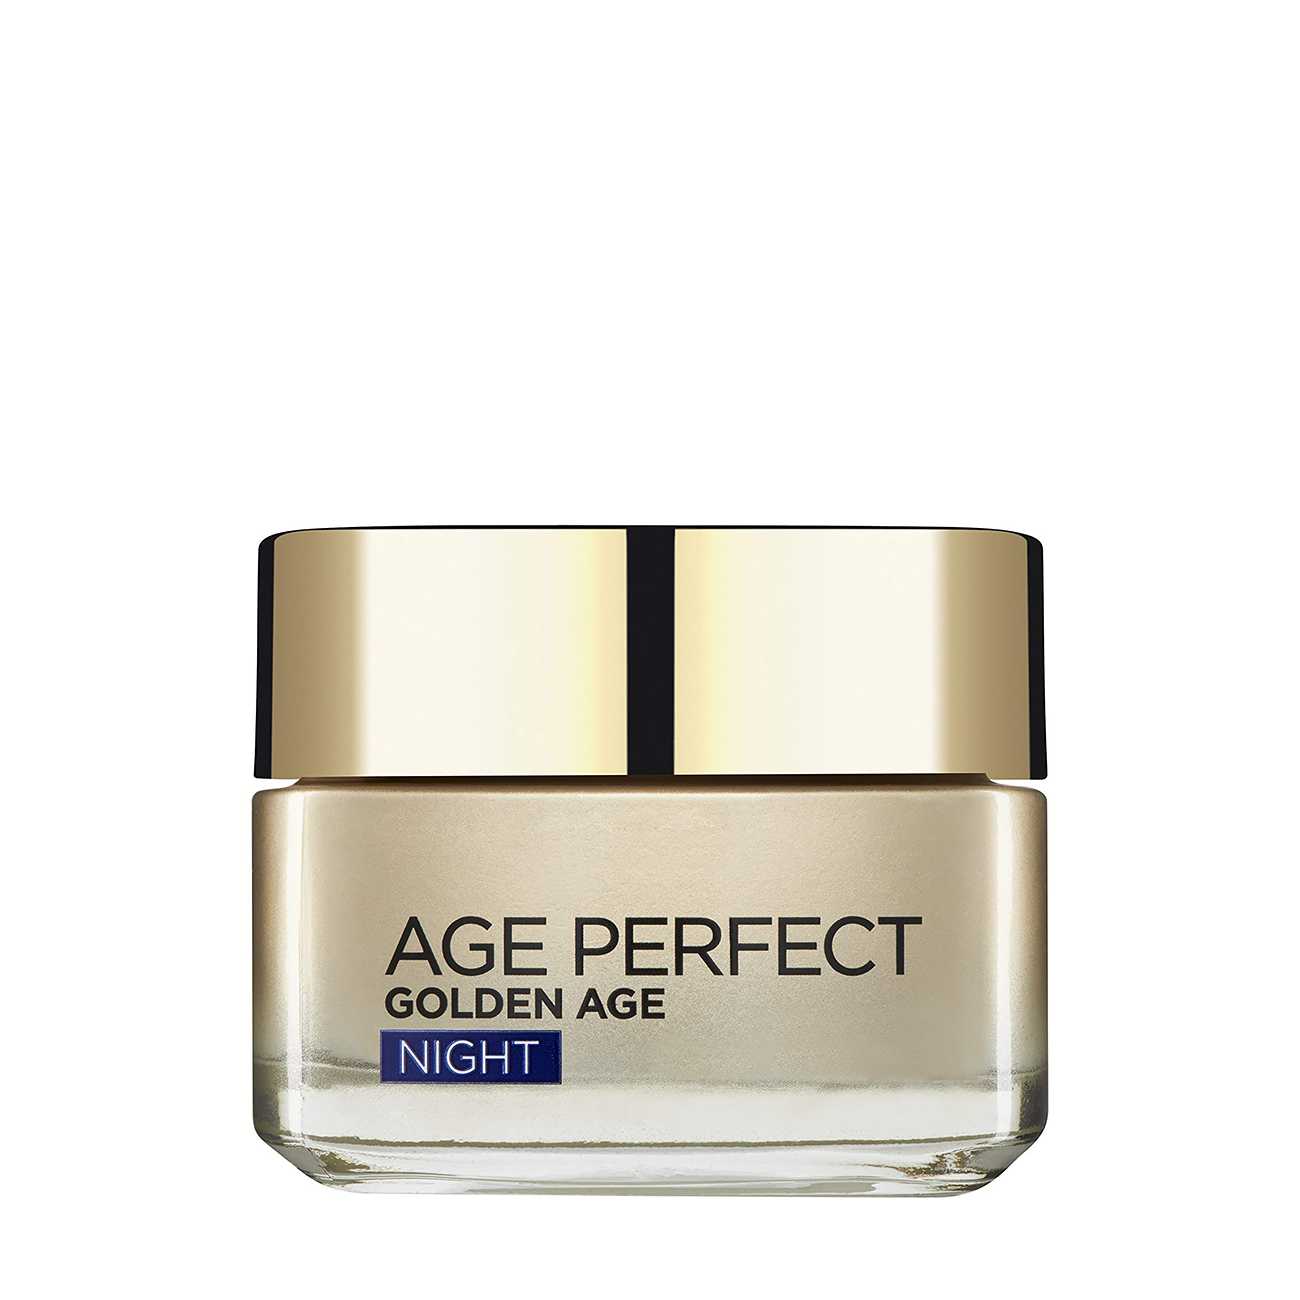 AGE PERFECT GOLDEN AGE NIGHT CREAM 50ml imagine produs